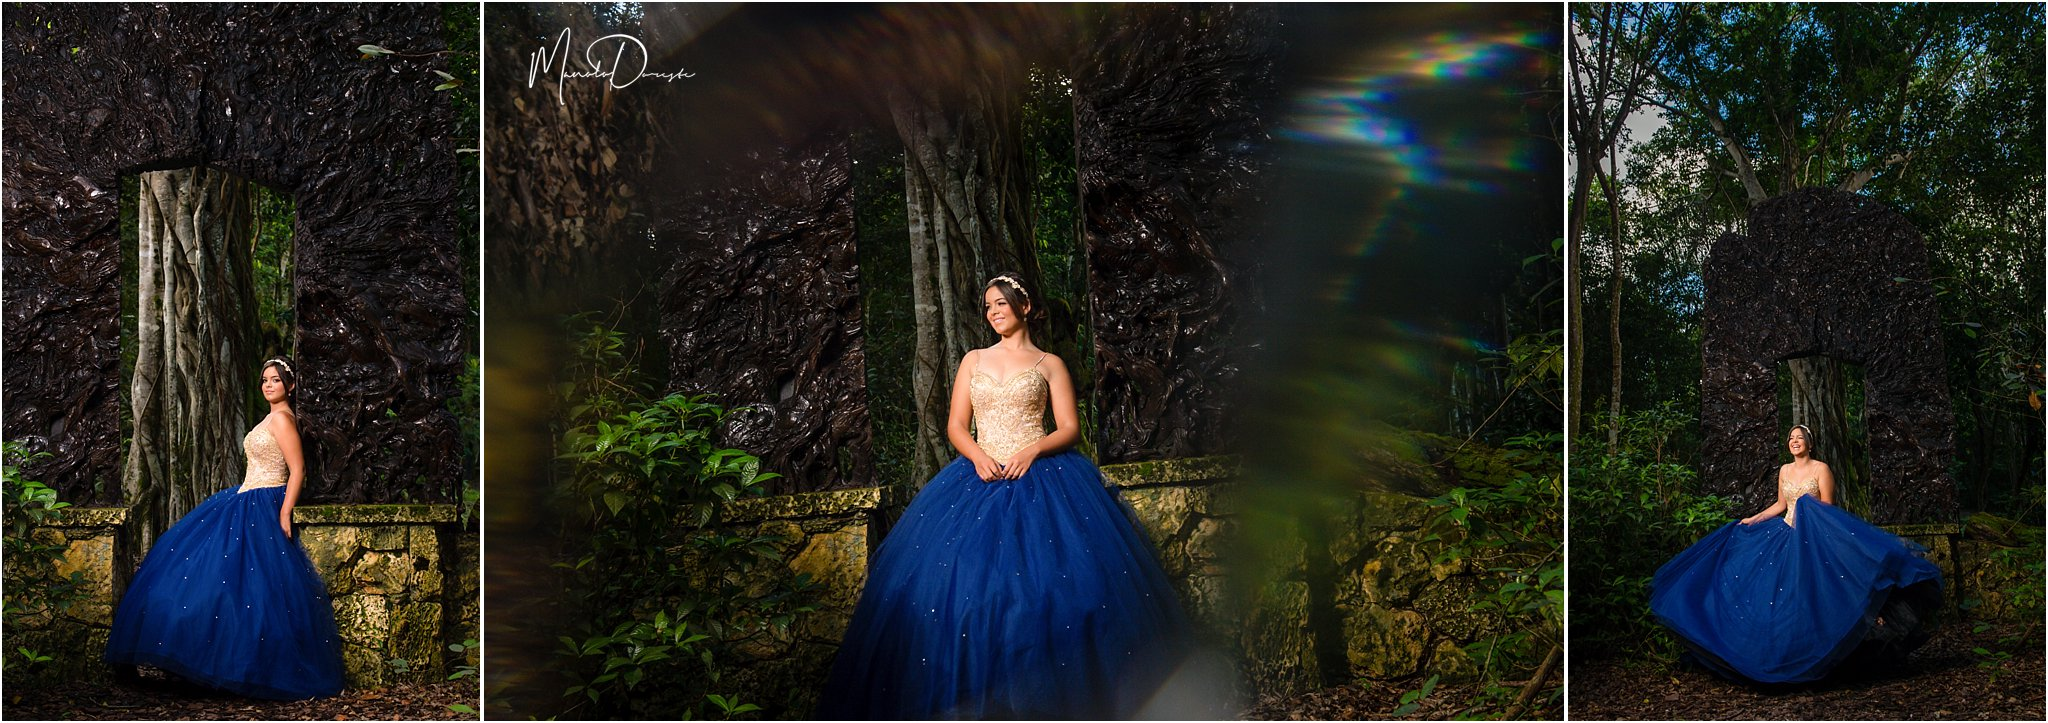 0335_ManoloDoreste_InFocusStudios_Wedding_Family_Photography_Miami_MiamiPhotographer.jpg